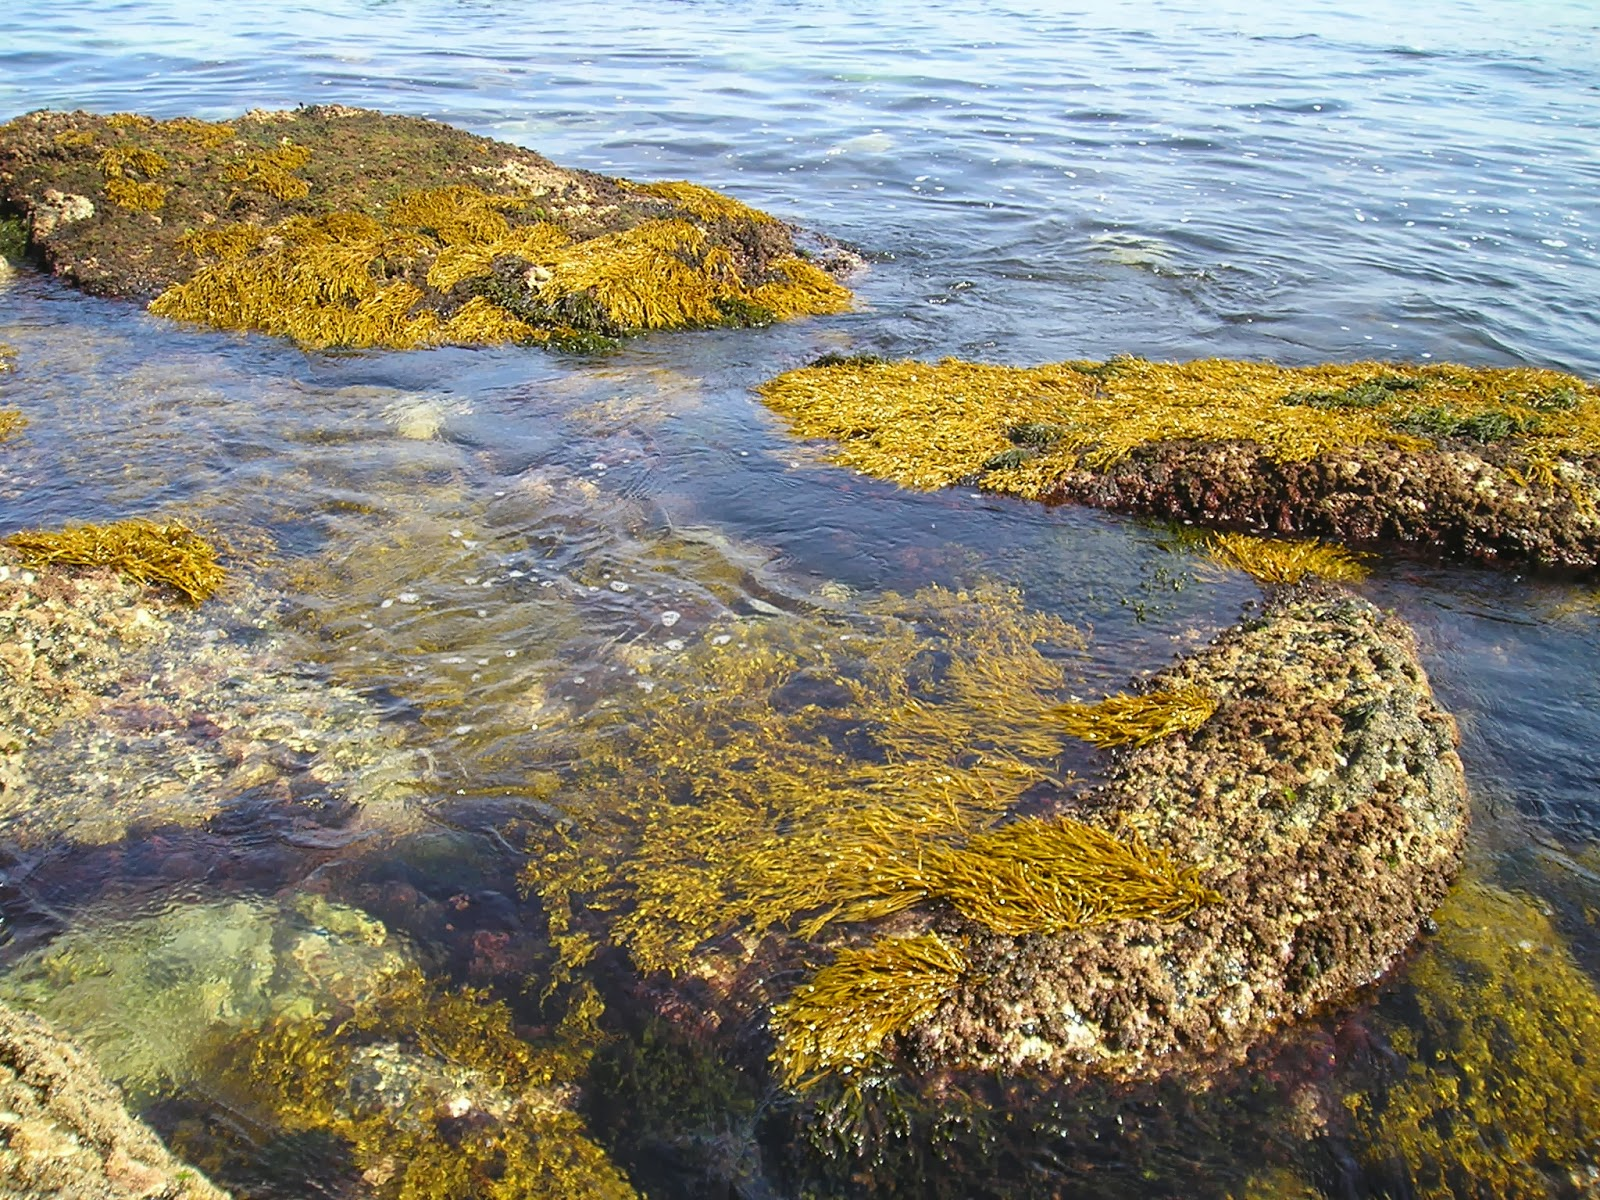 Diagnosis prospectiva sobre la diversidad de diatomeas epilíticas en la laguna Bacalar, Quintana Roo, México